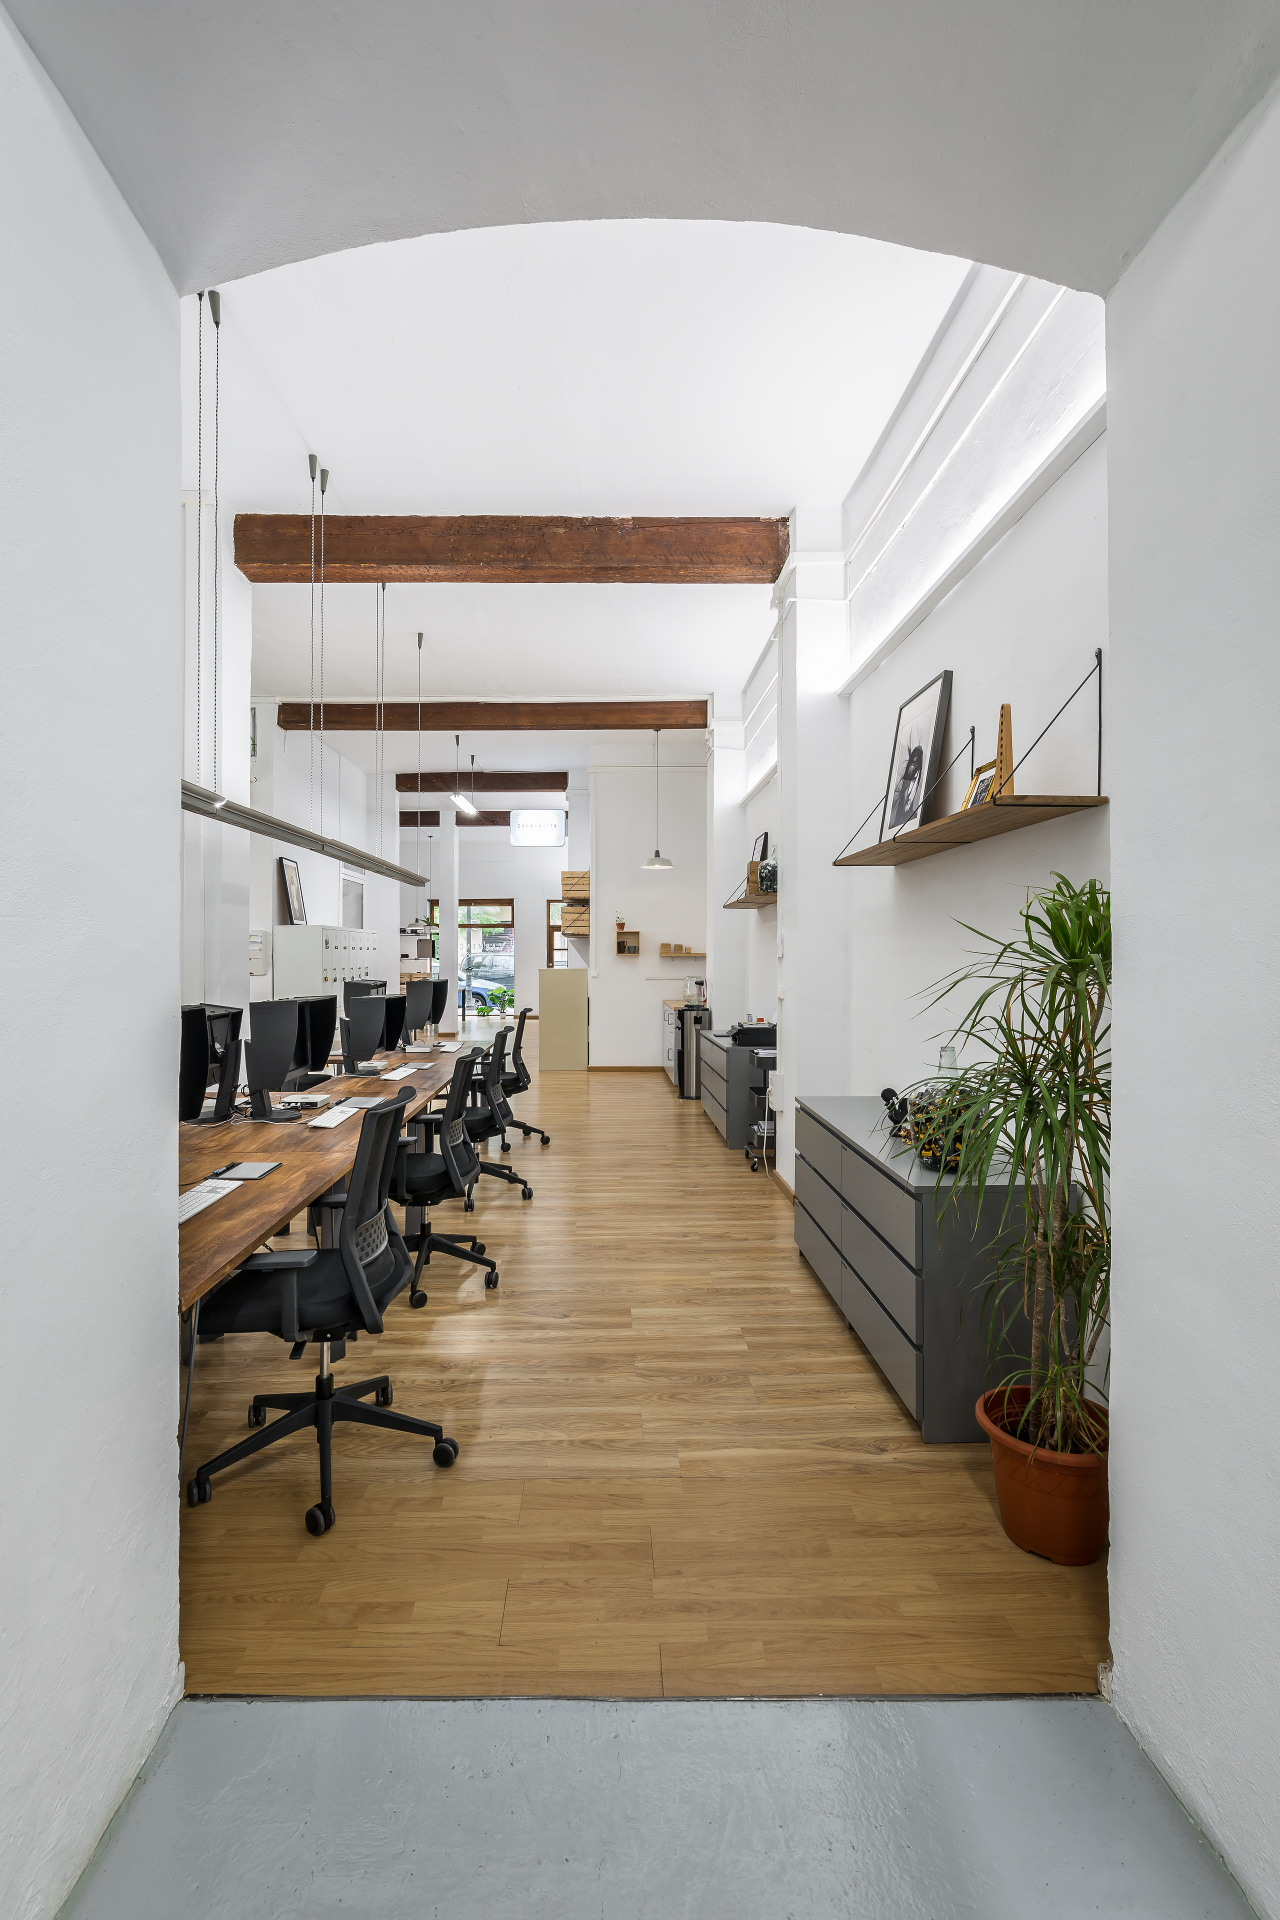 fotografia-arquitectura-interiorismo-valencia-german-cabo-boubau-carmencita-carmencitafilmlab (23)